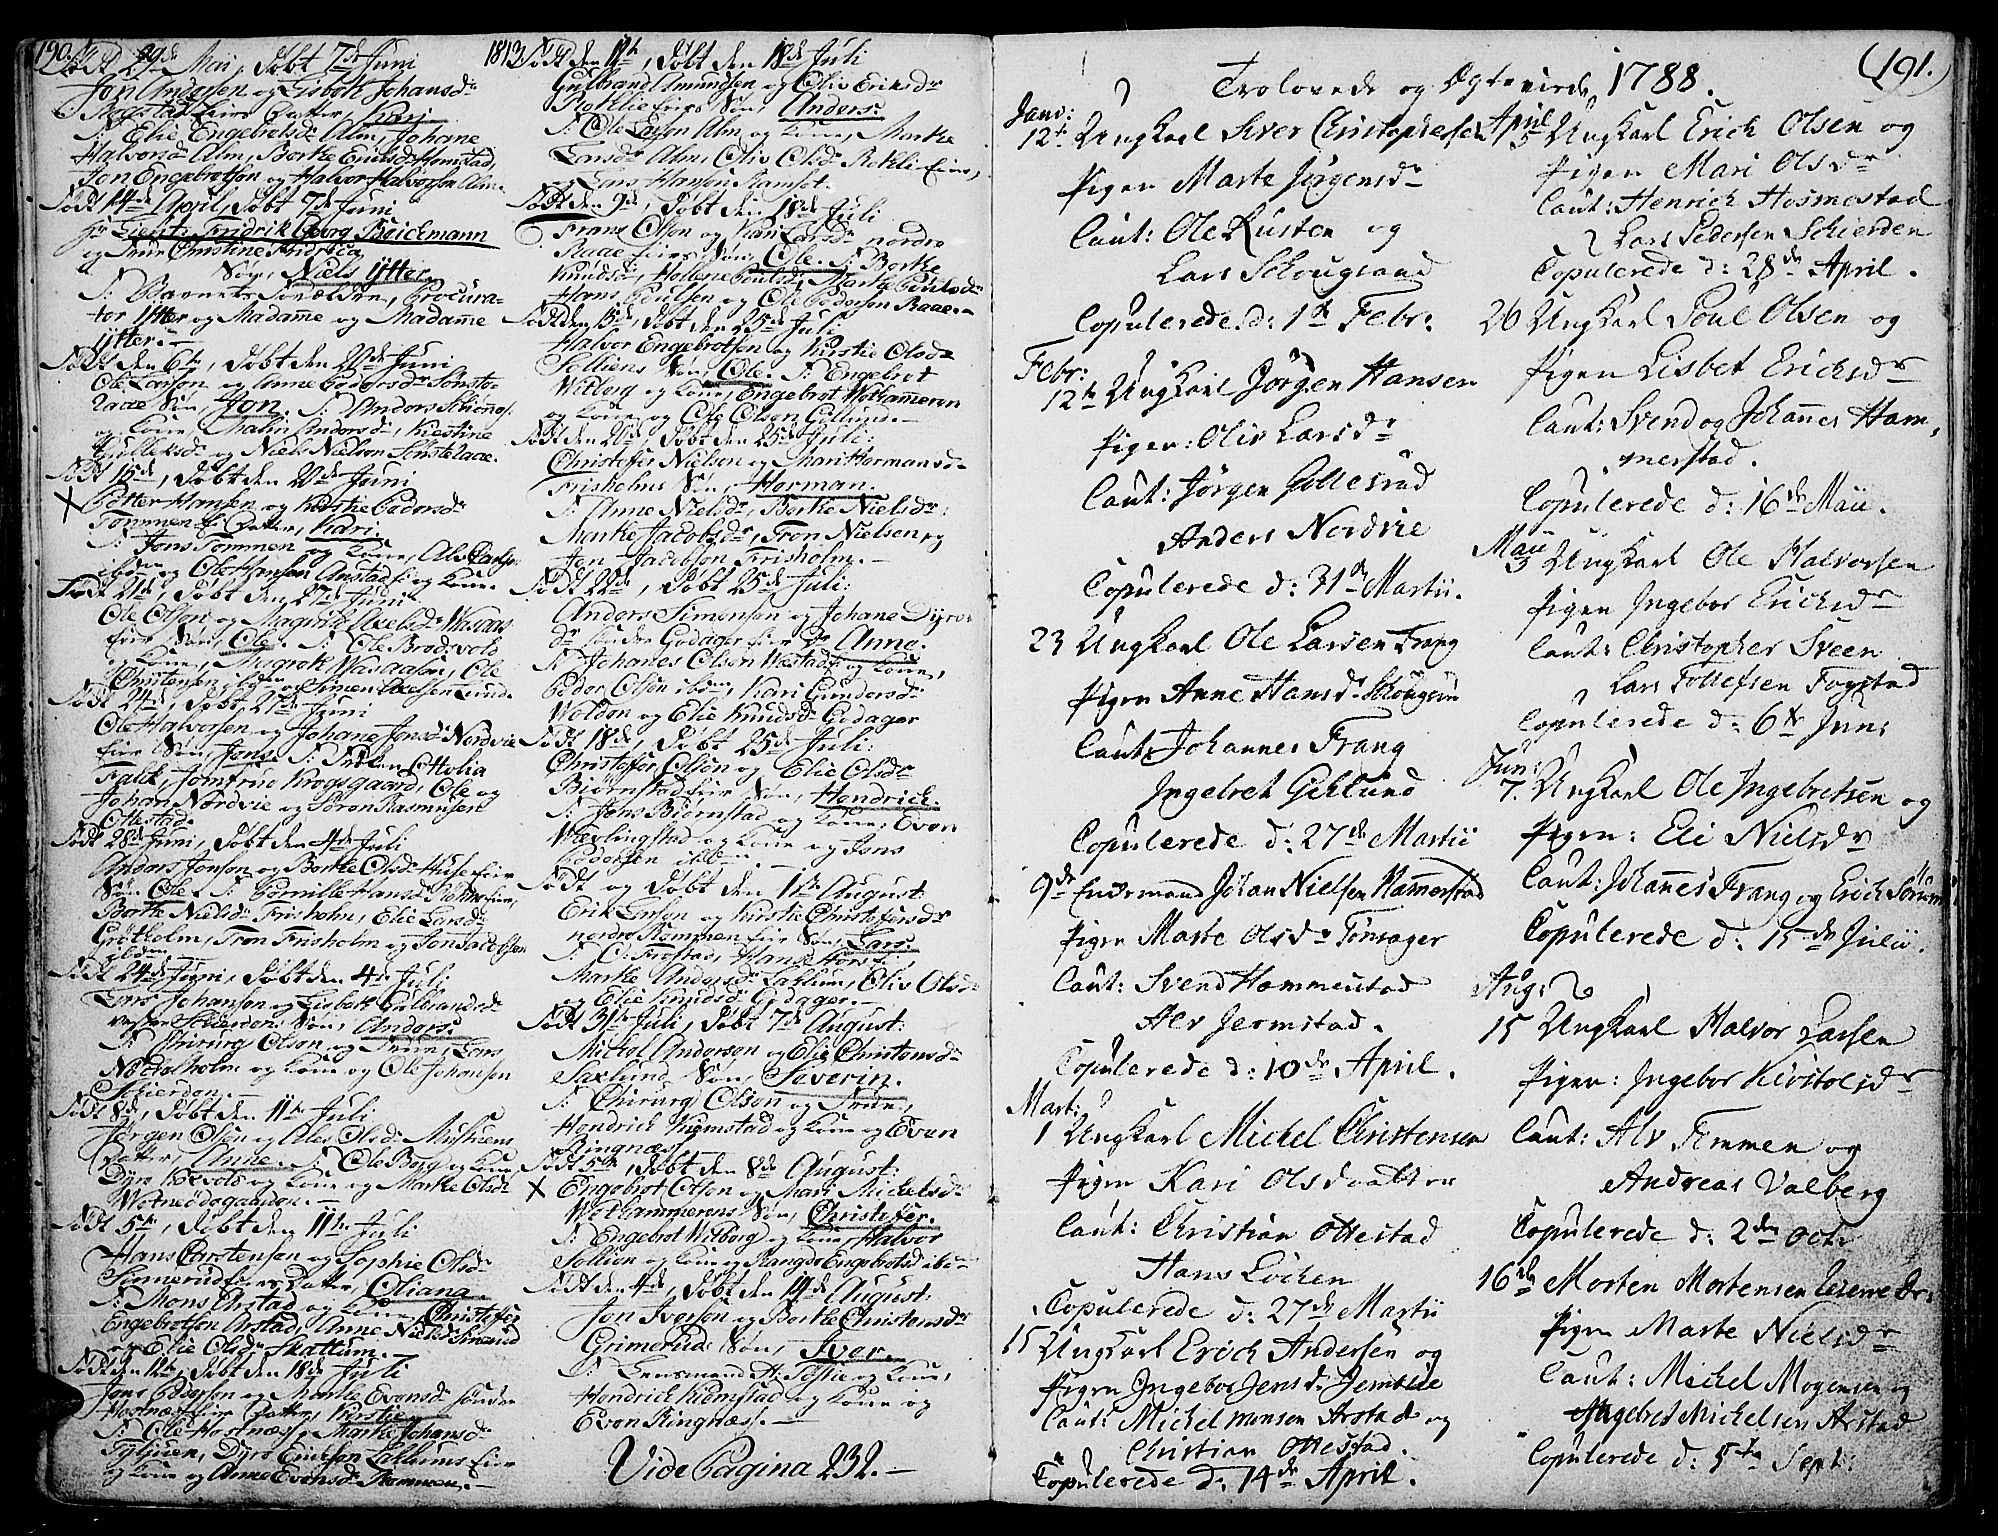 SAH, Stange prestekontor, K/L0007: Ministerialbok nr. 7, 1788-1813, s. 190-191